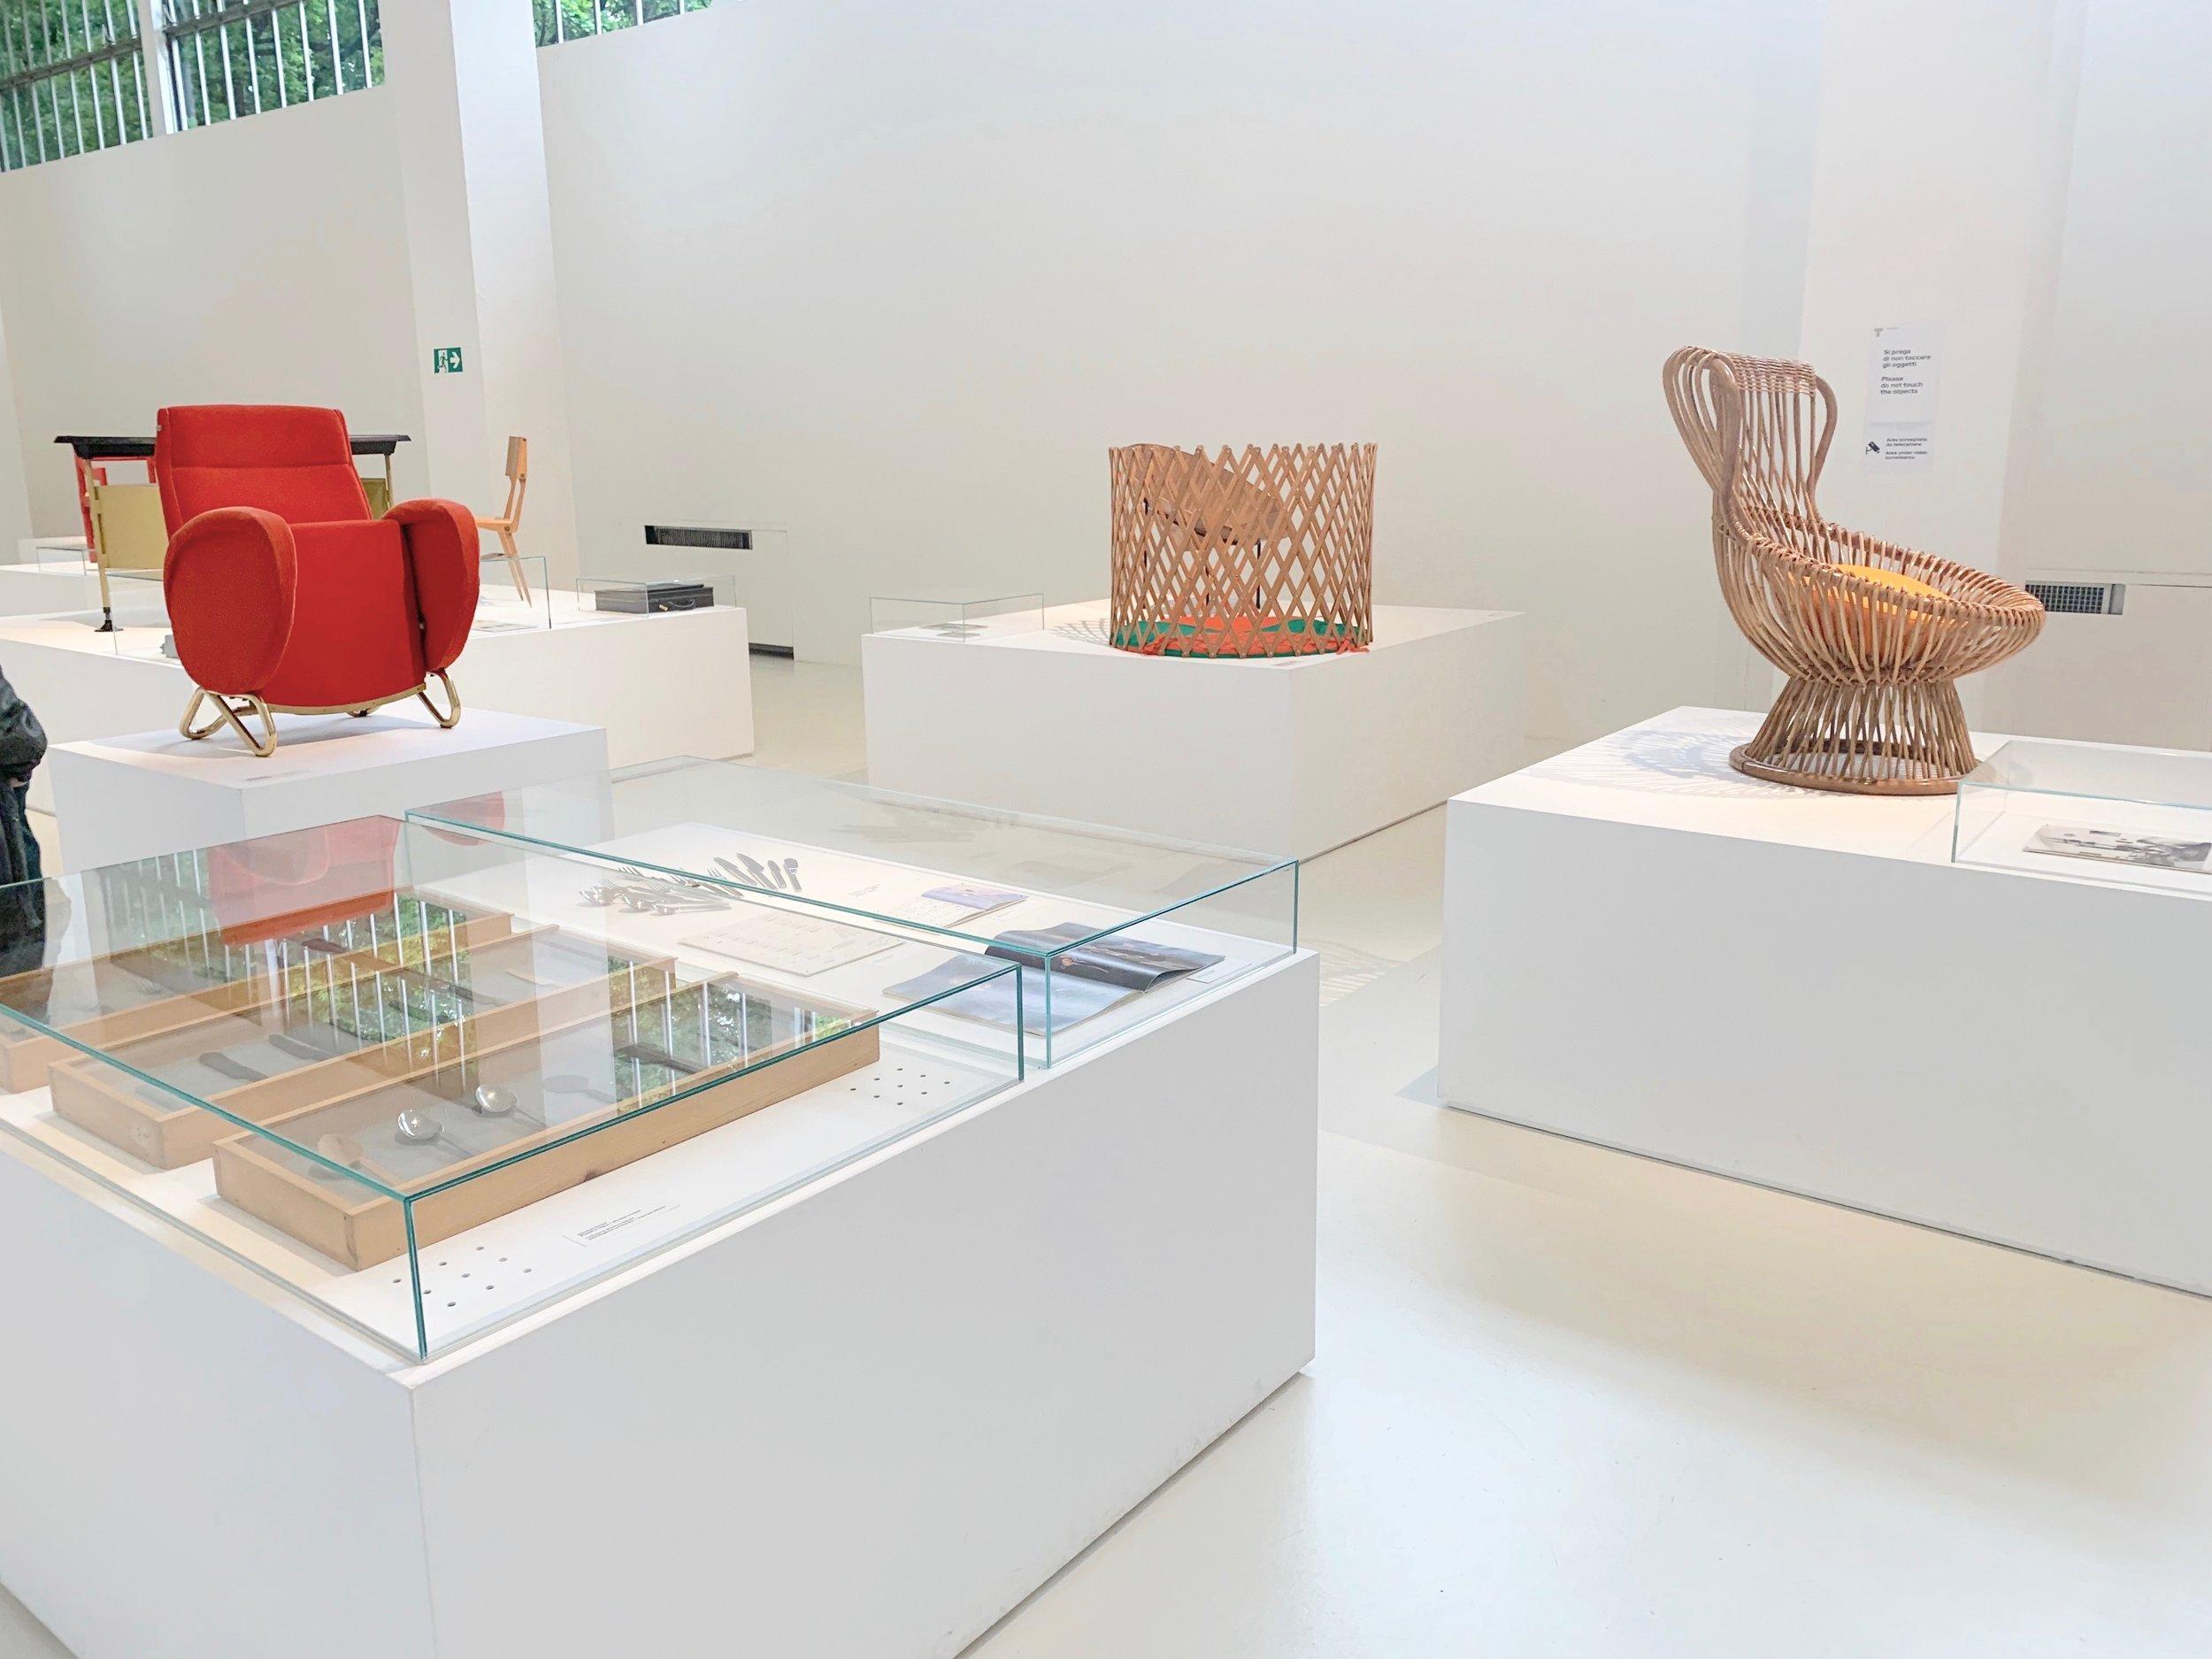 Museum Of Italian Design - Italian Mid Century Modern Furniture Designitalia00007.jpeg